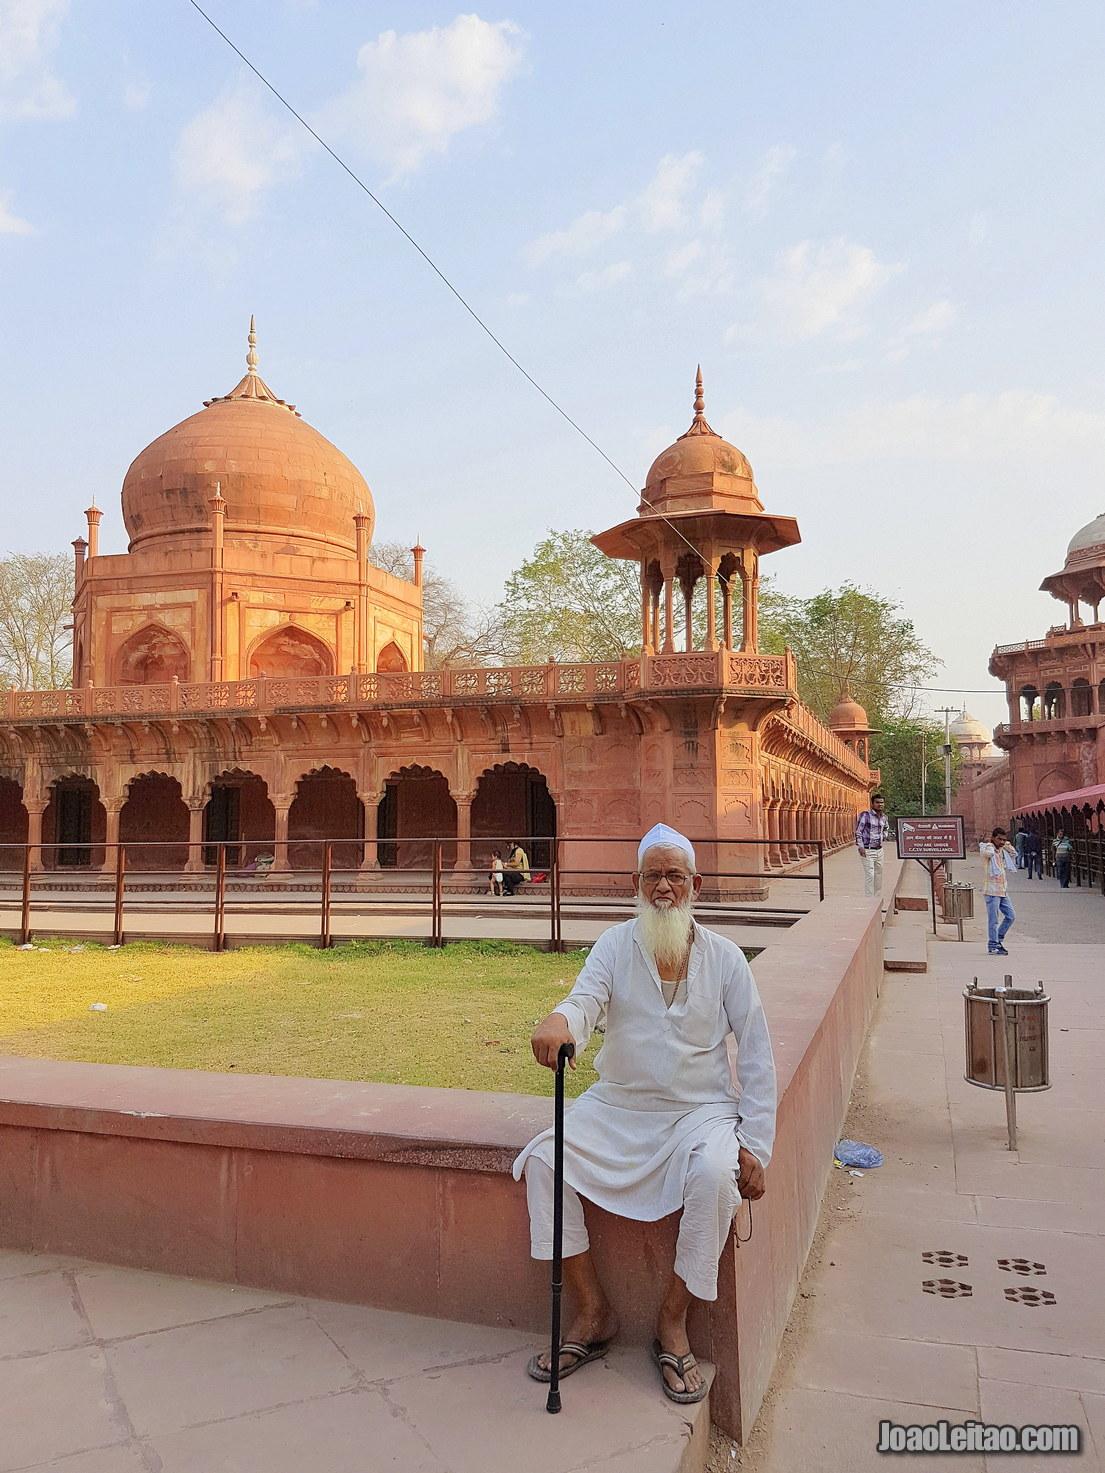 Curiosities about the Taj Mahal